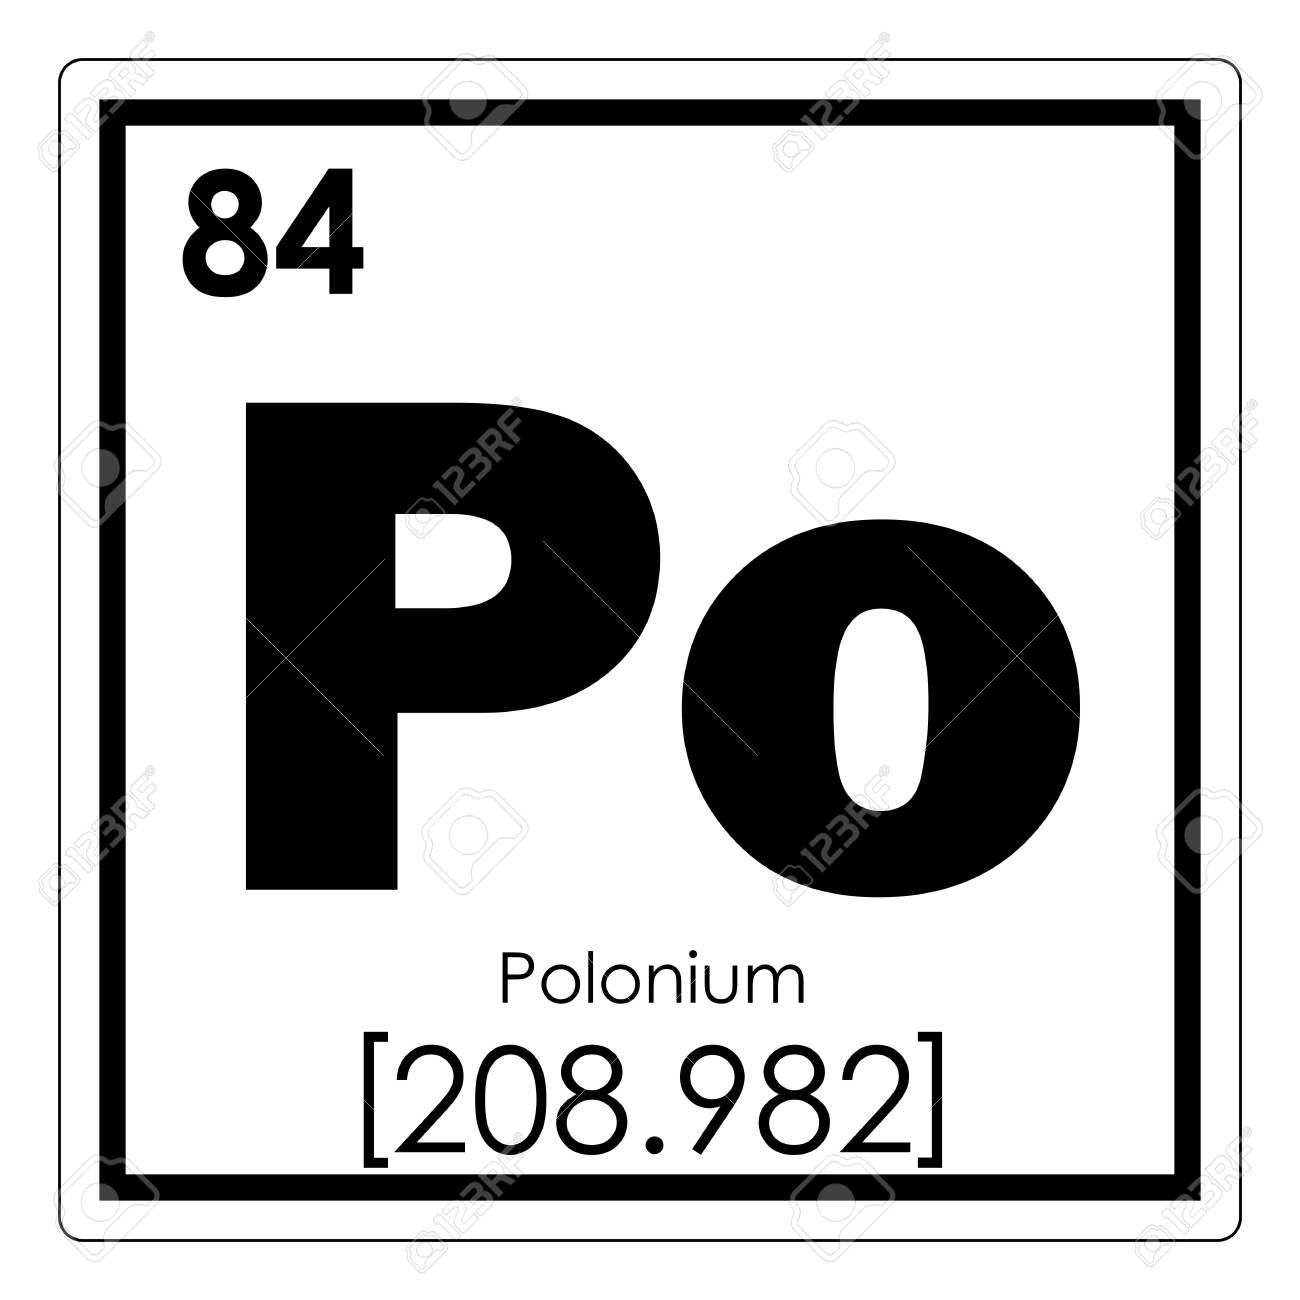 Polonium chemical element periodic table science symbol stock photo polonium chemical element periodic table science symbol stock photo 93638019 urtaz Images